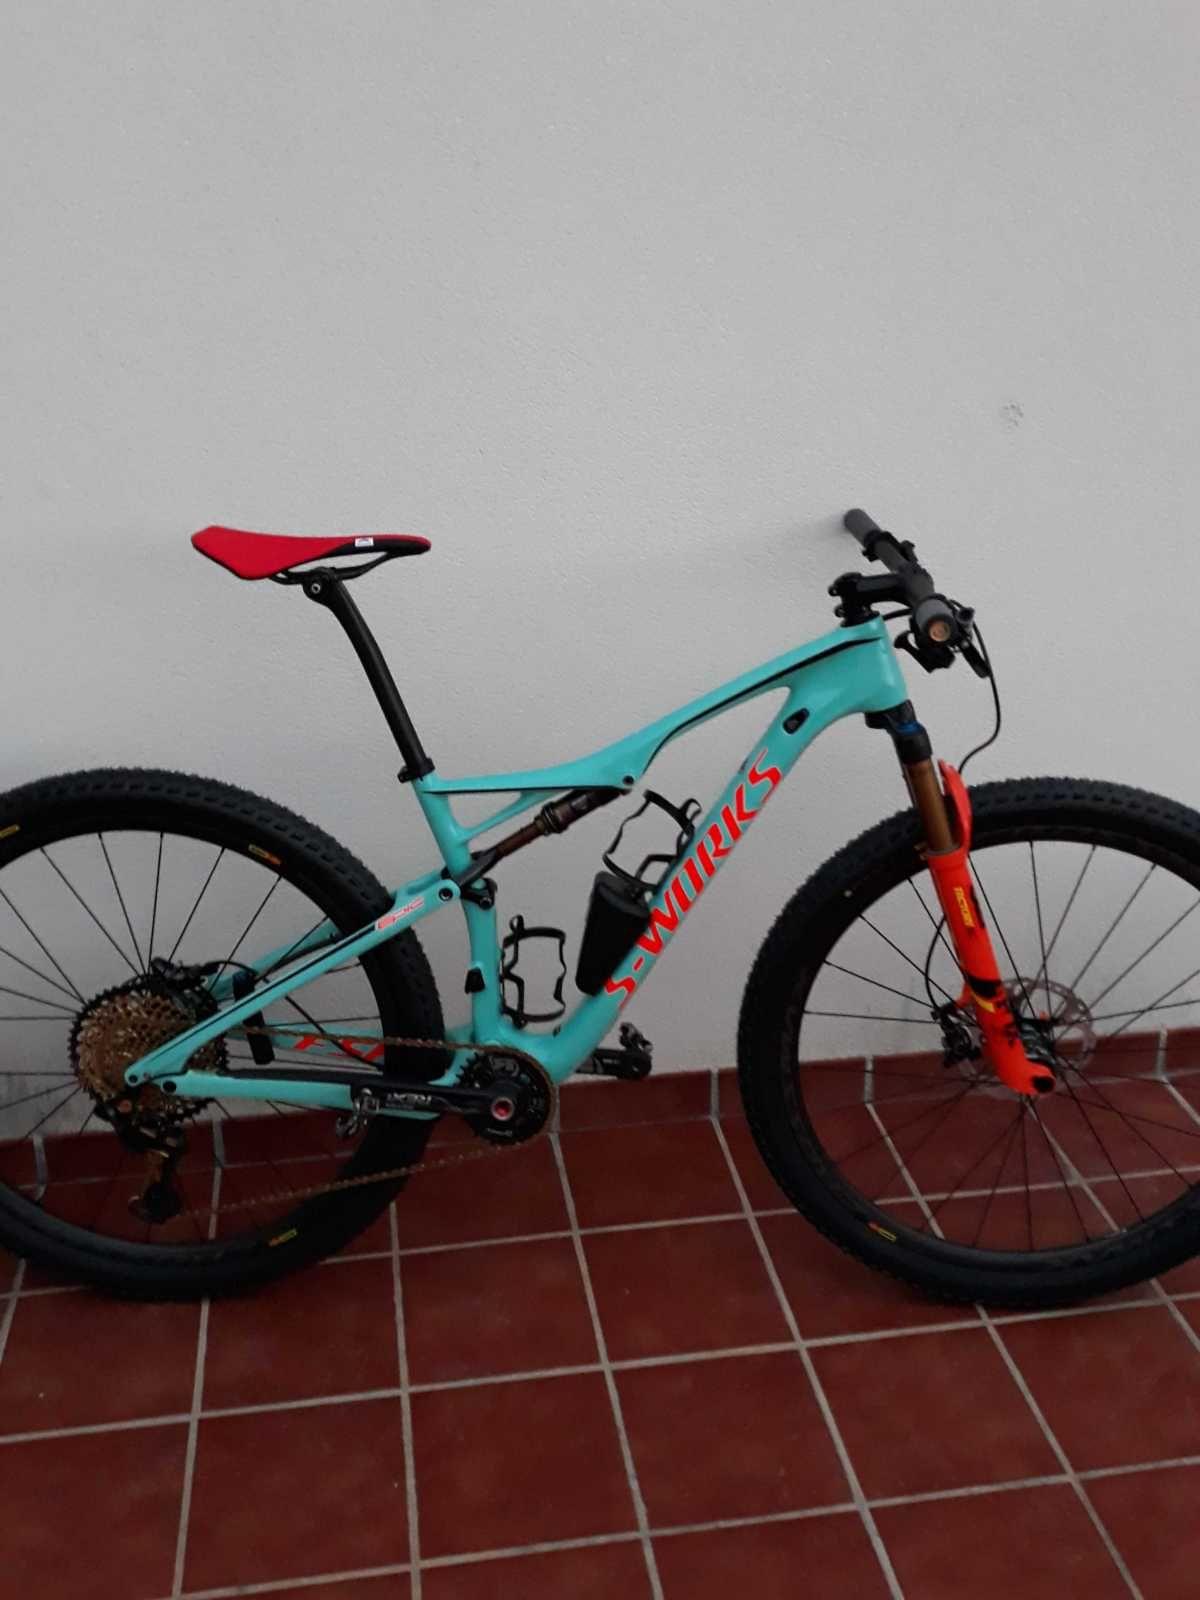 Bicicleta De Montaña Specialized Epic Ref 44521 Talla M Año 2017 Cambio Sram Xx1 Eagle Cuadro De Ca Bicicletas Bicicletas Mountain Bike Bicicletas Enduro